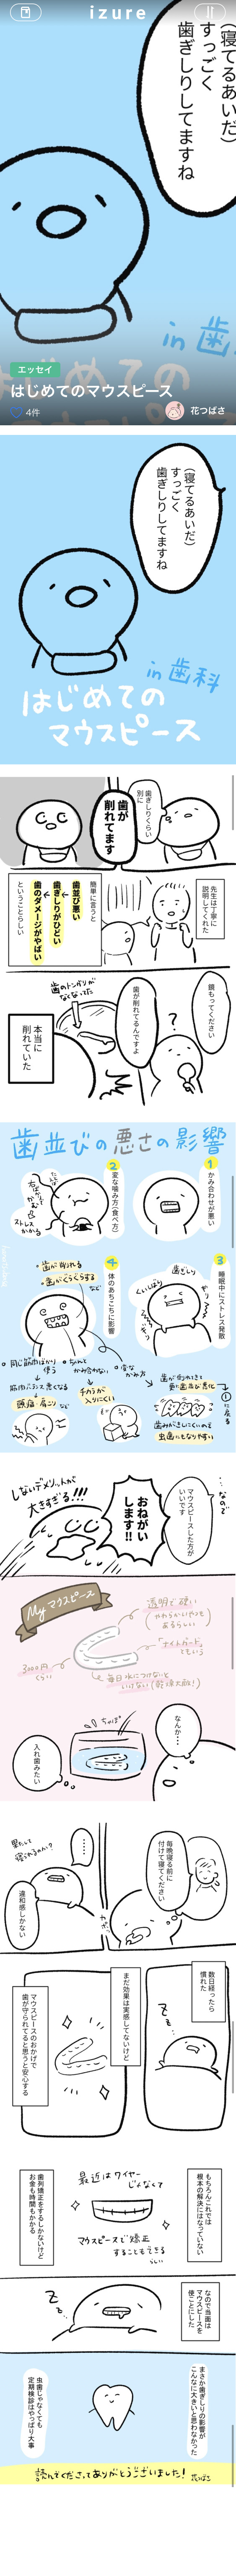 hanatsybasa_1.jpg